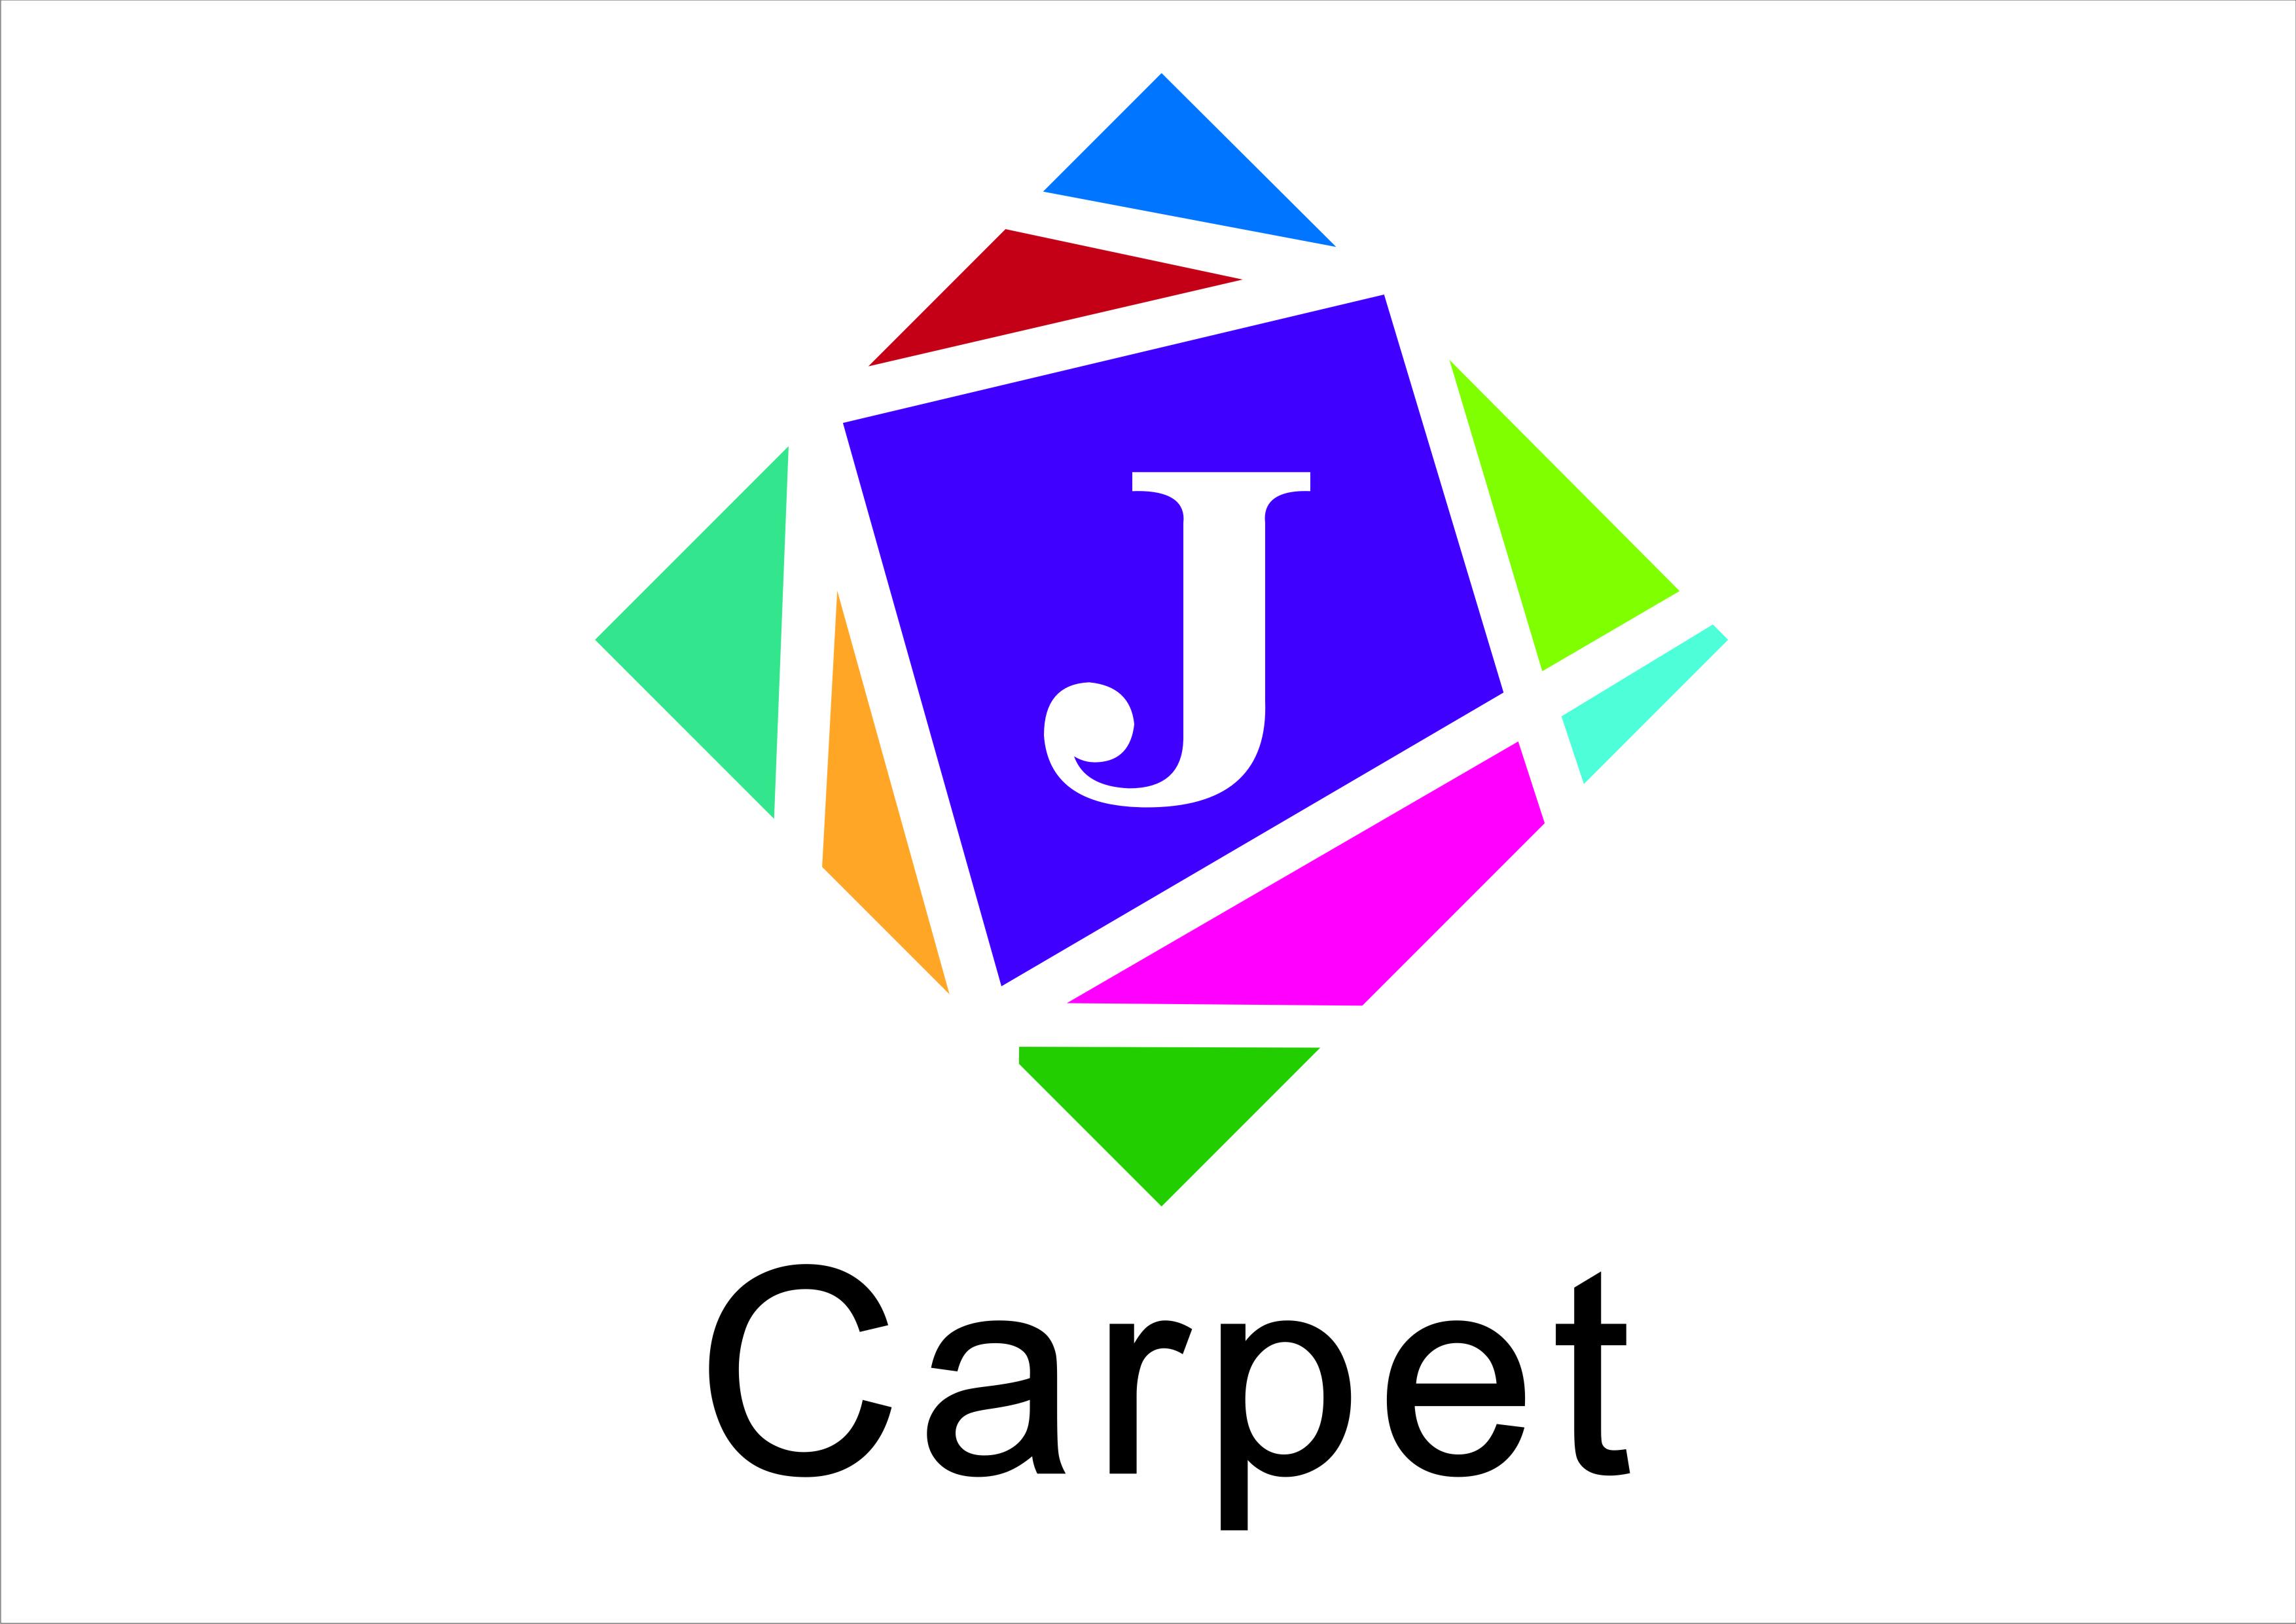 J-Carpet